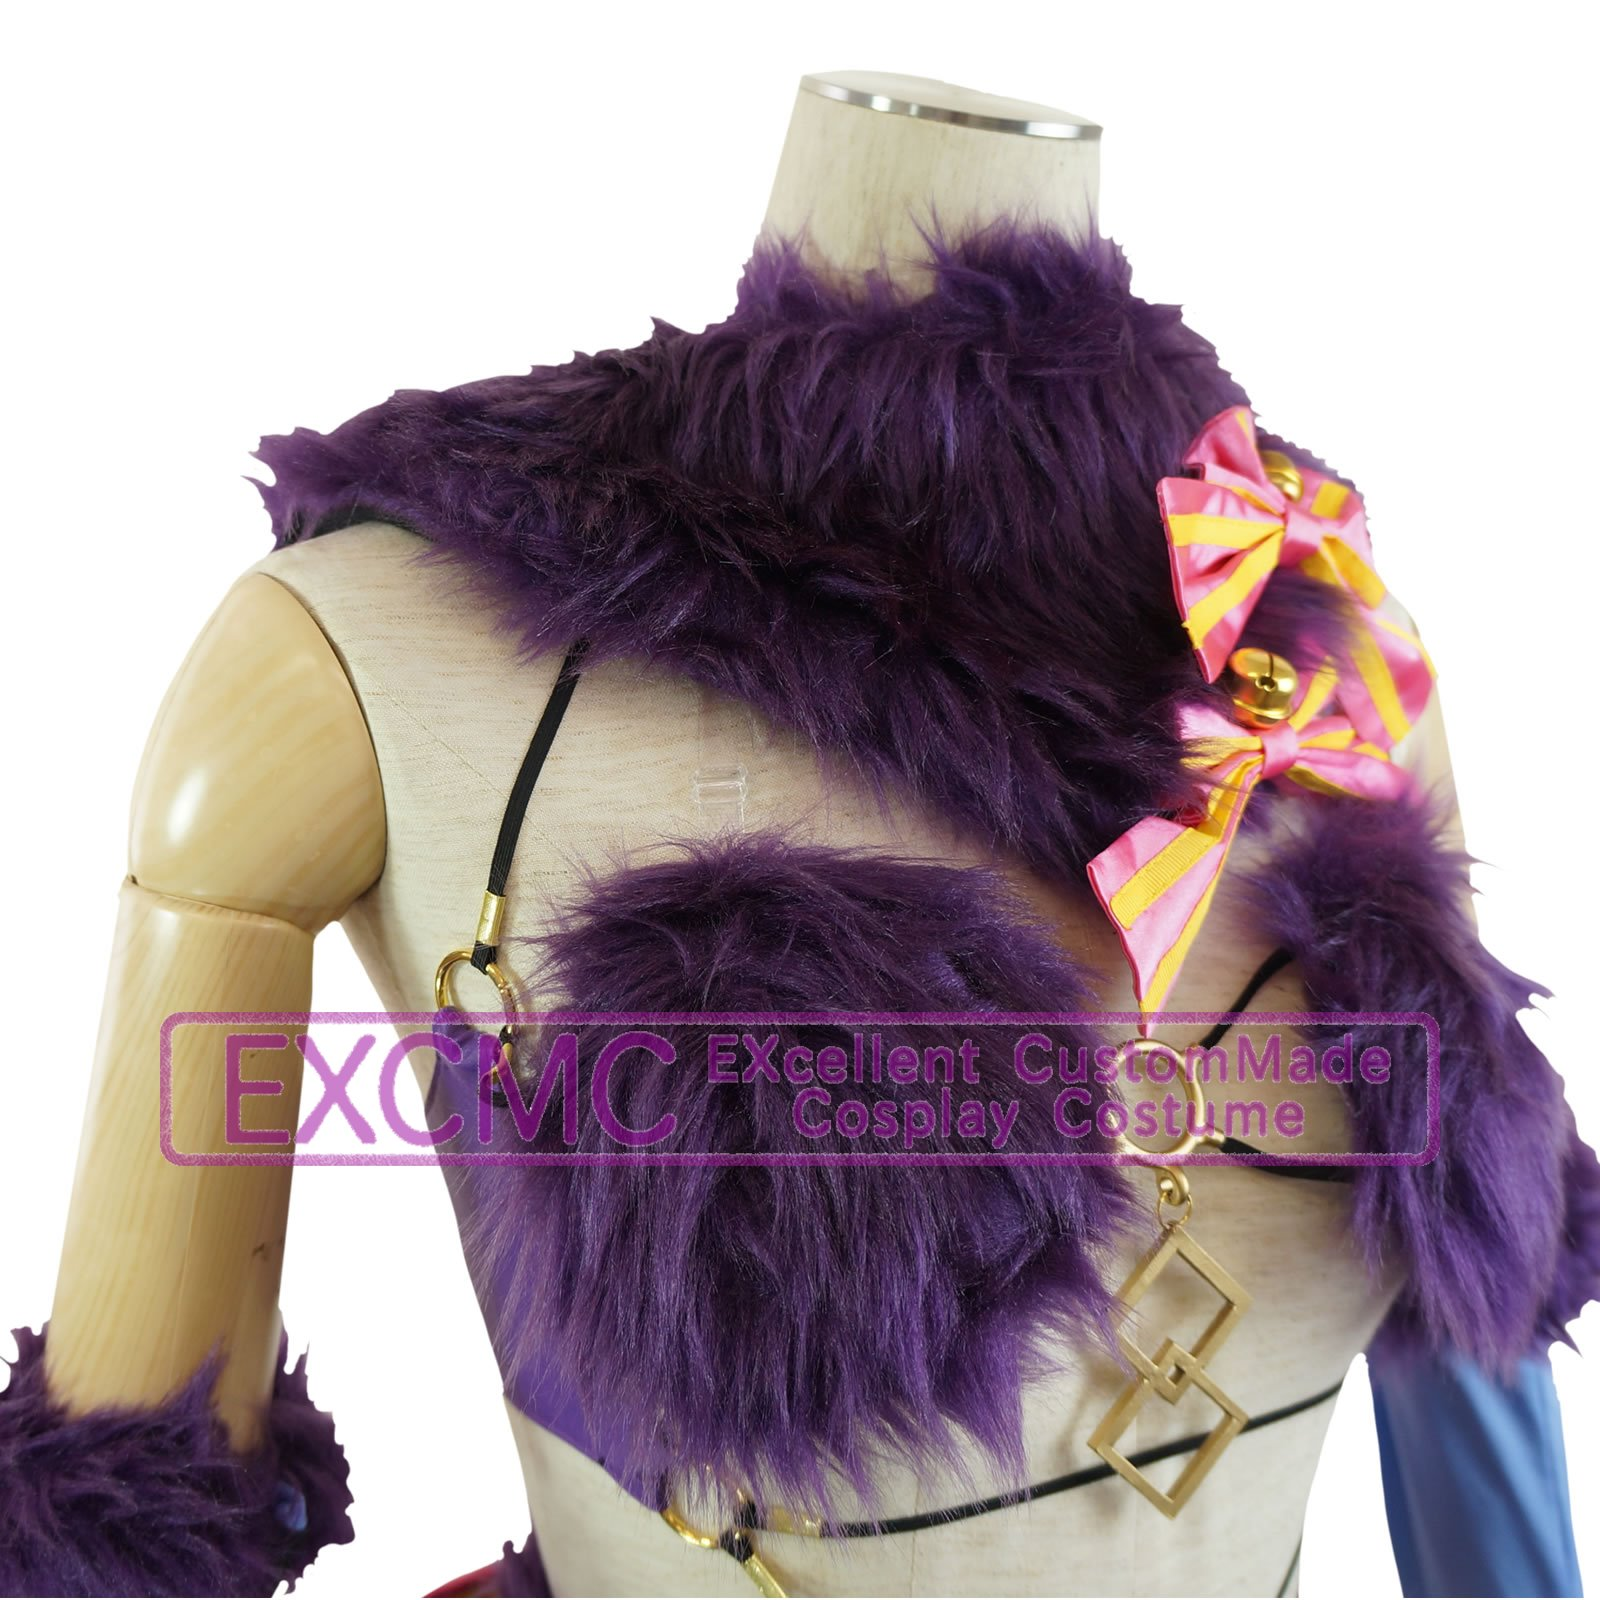 Fate Grand Order マシュ・キリエライト 概念礼装(デンジャラス・ビースト) 風 コスプレ衣装6